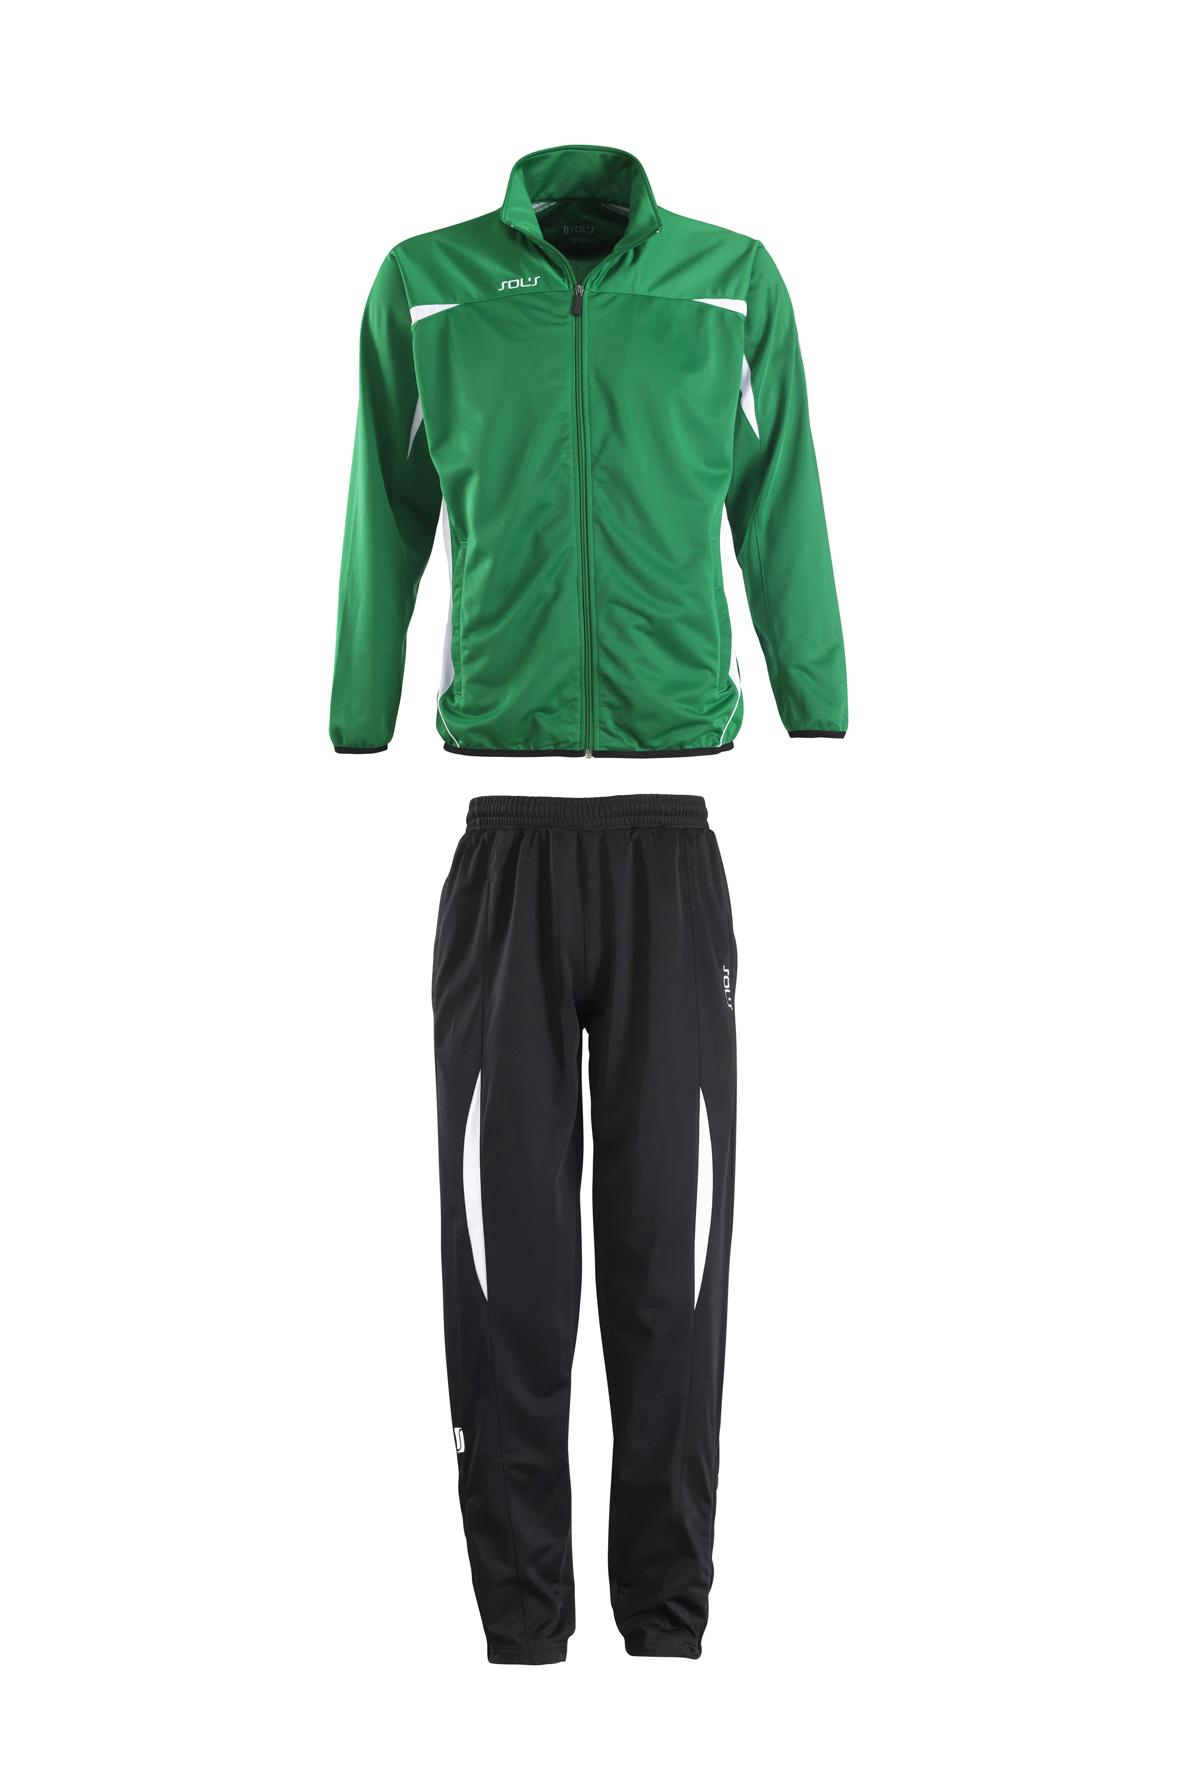 Camp Nou - Bright Green/White/Black - XXL